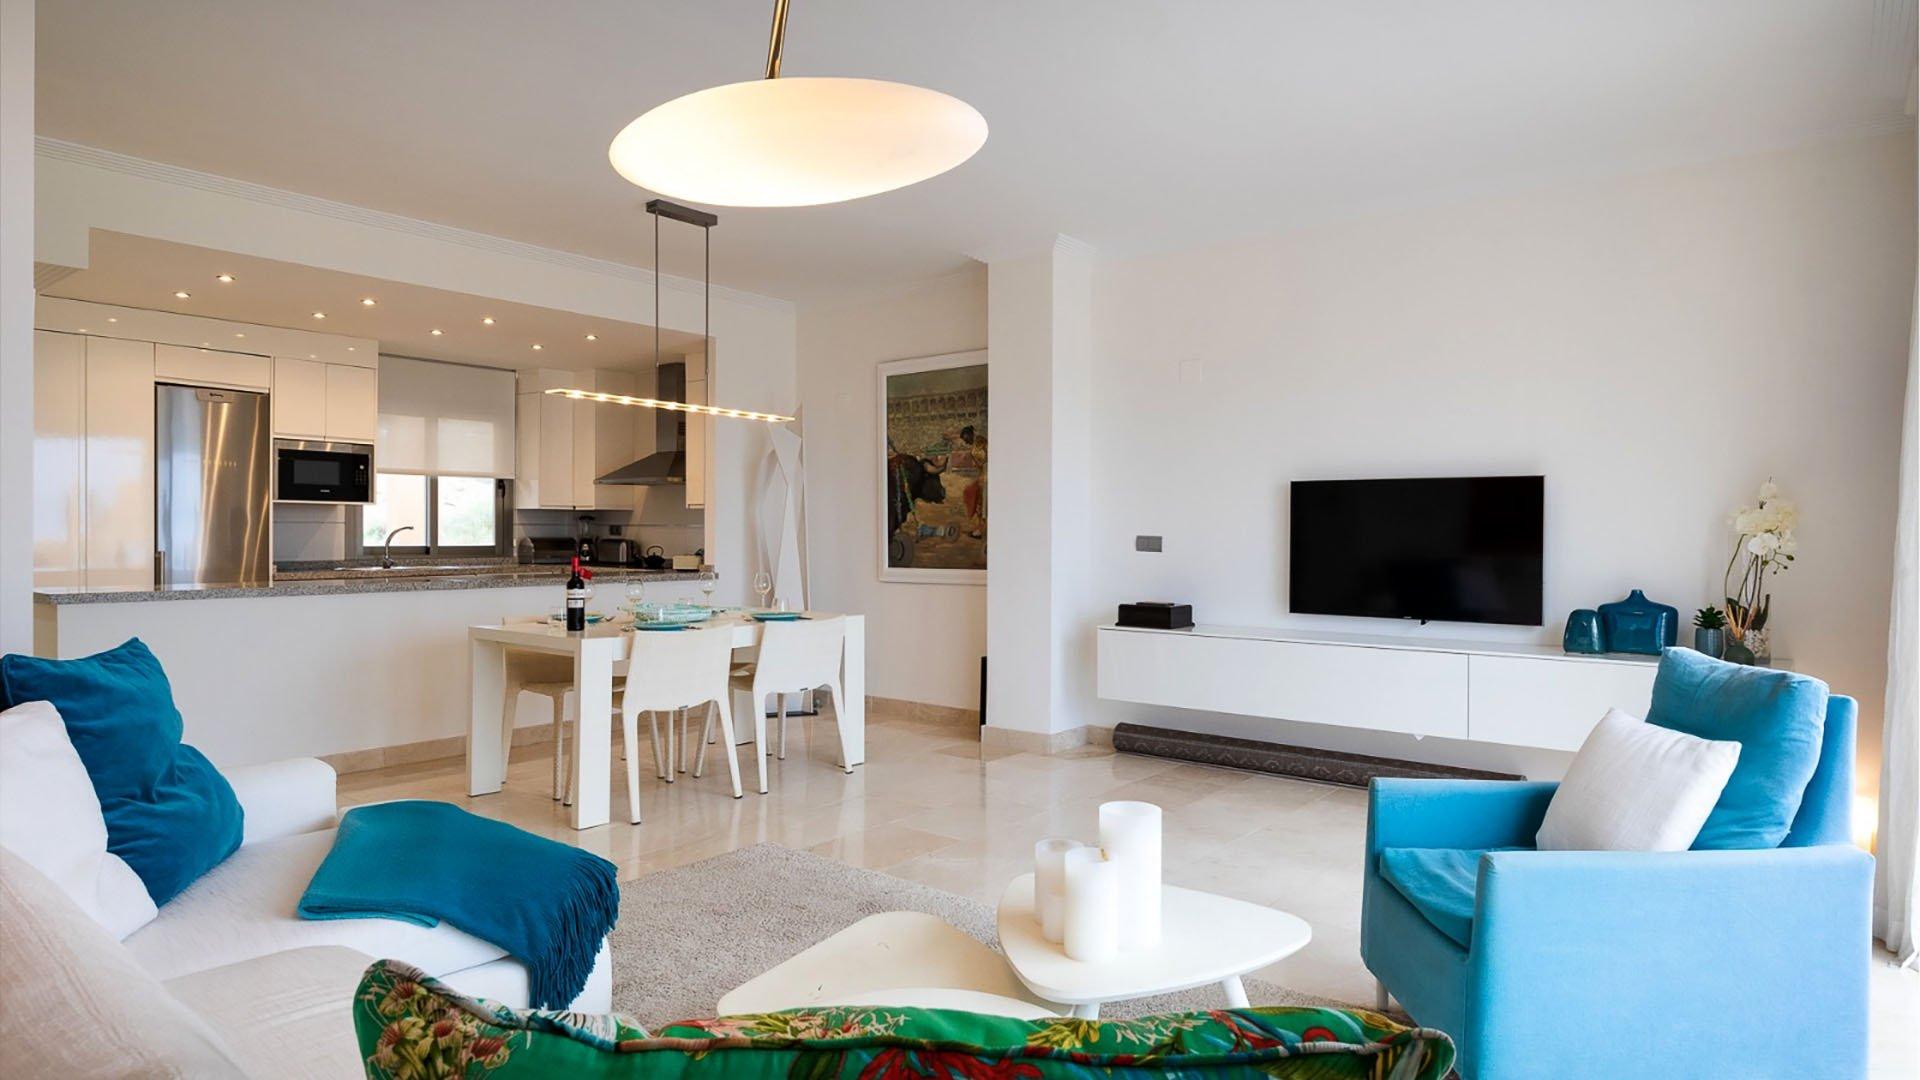 La Resina Golf 388: Renovated penthouse in Estepona, La Resina Golf